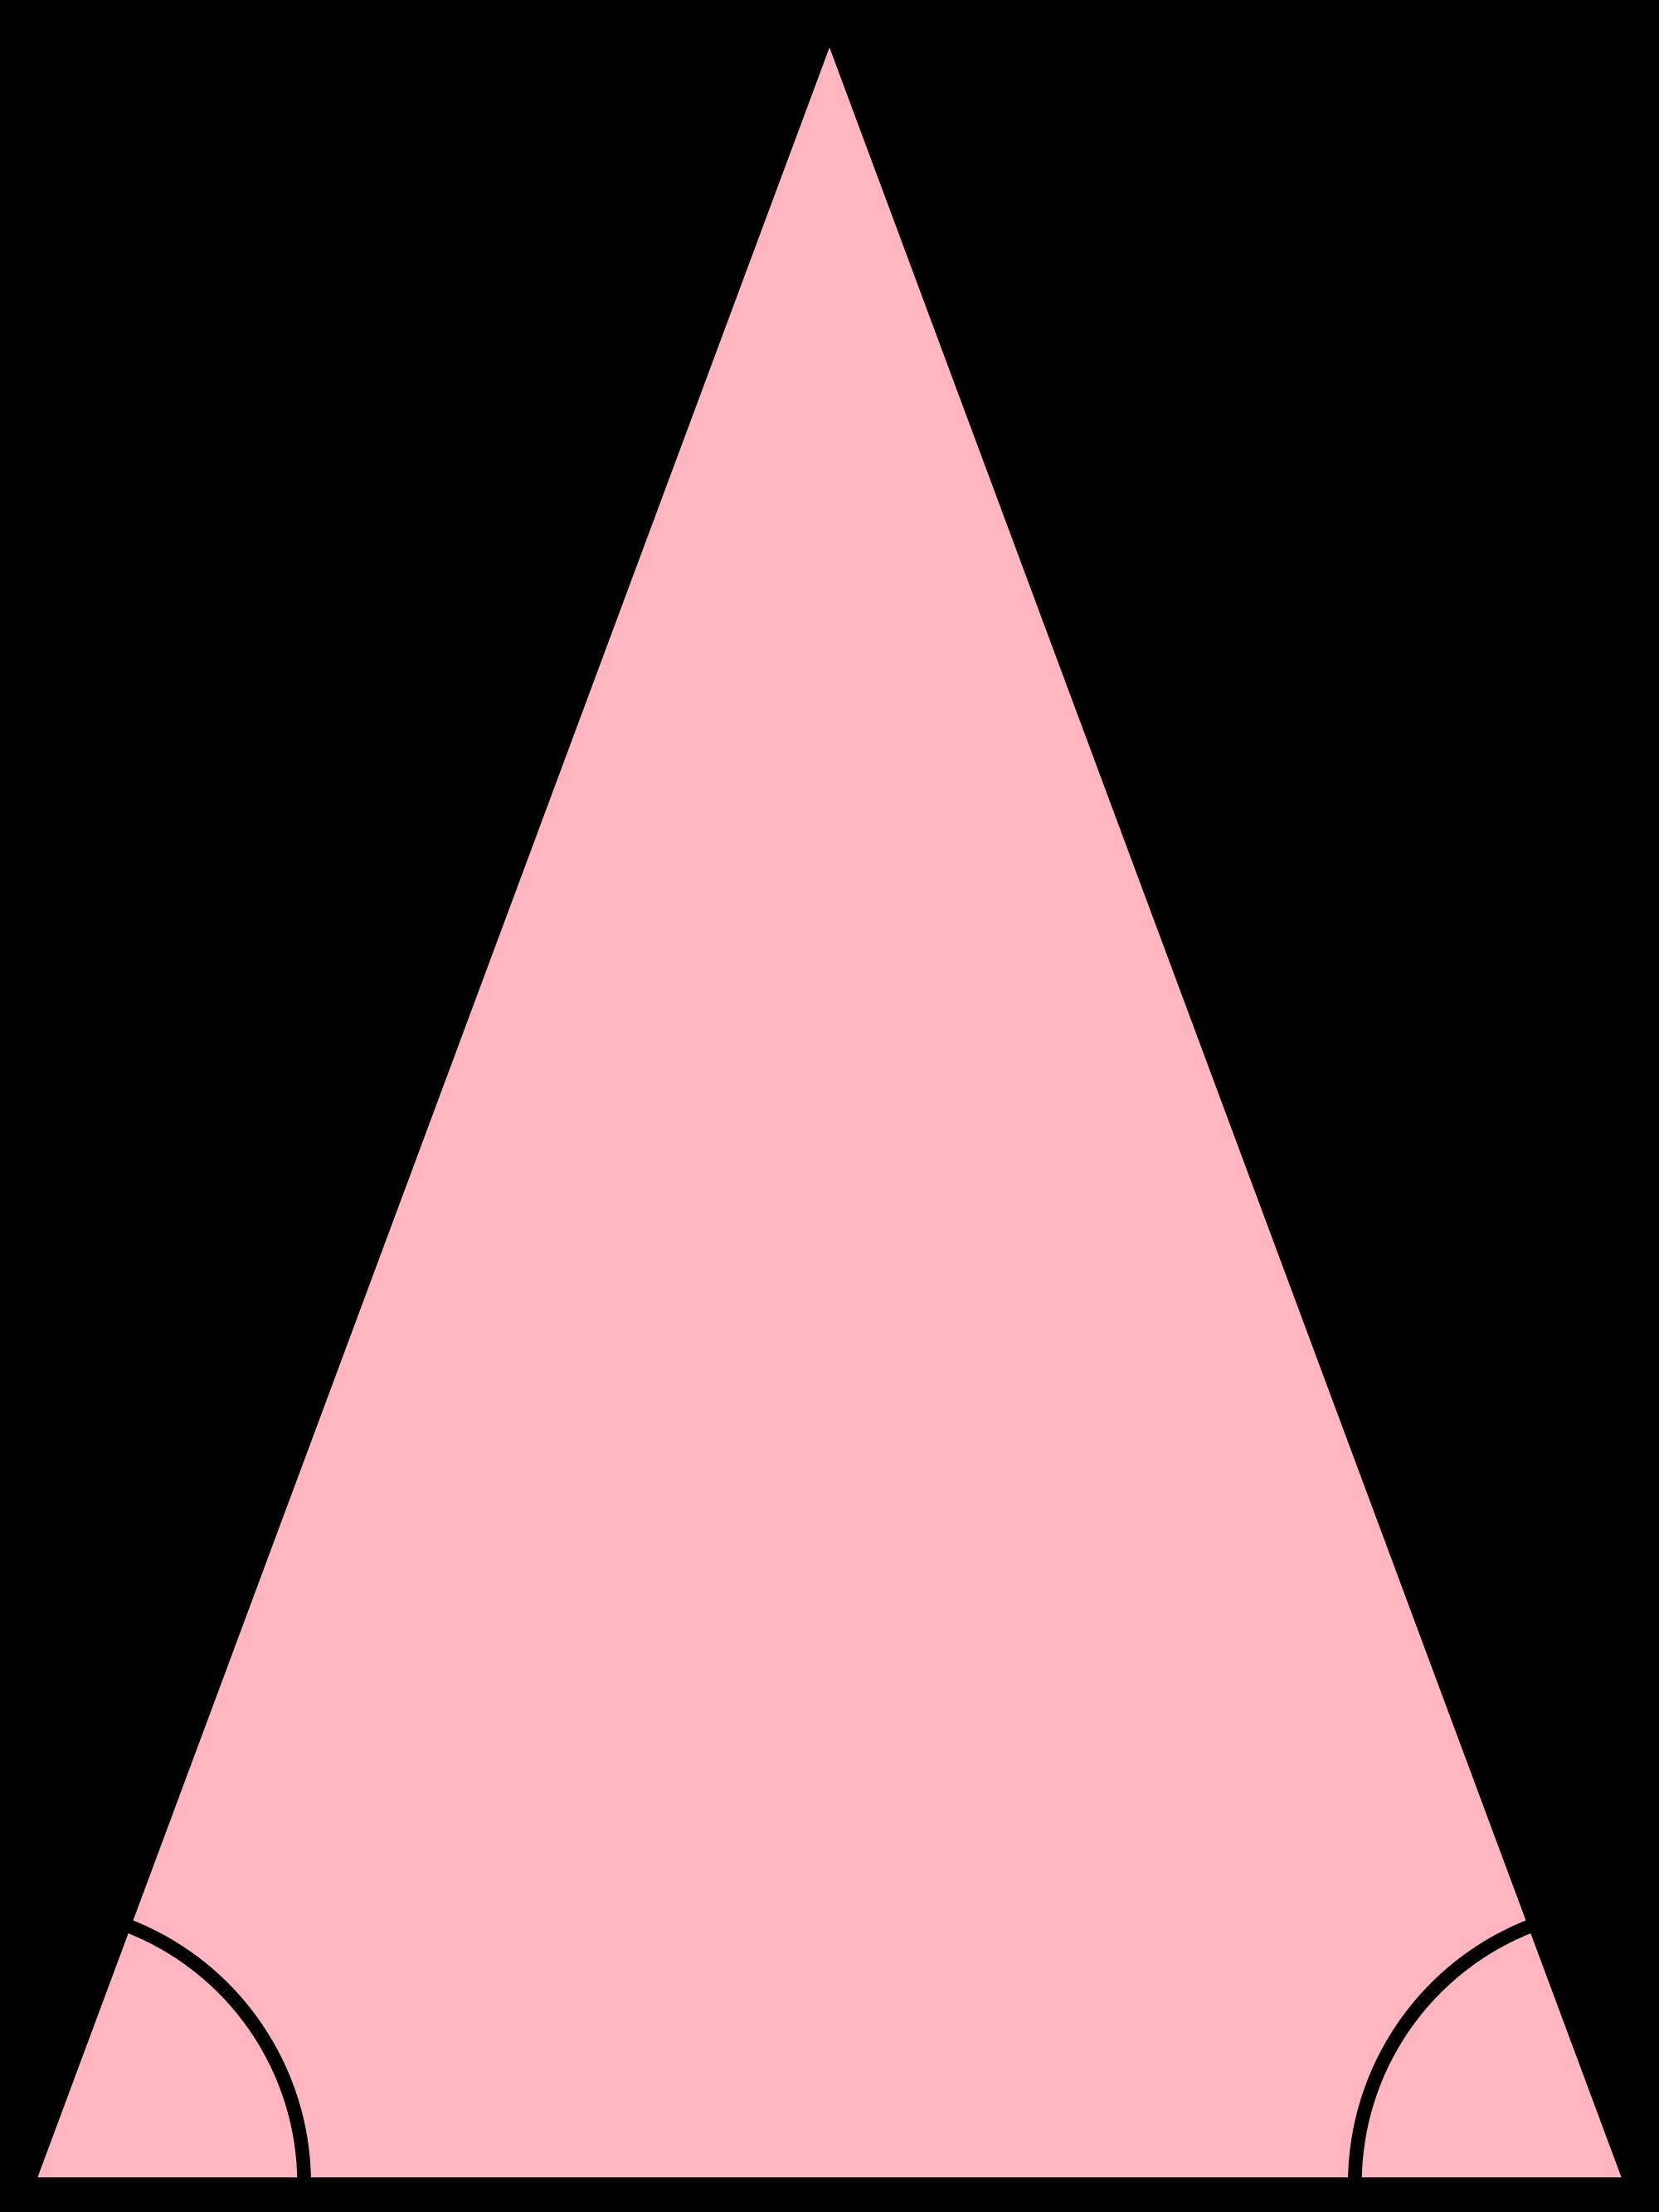 Triangular clipart isosceles triangle, Picture #2154207.